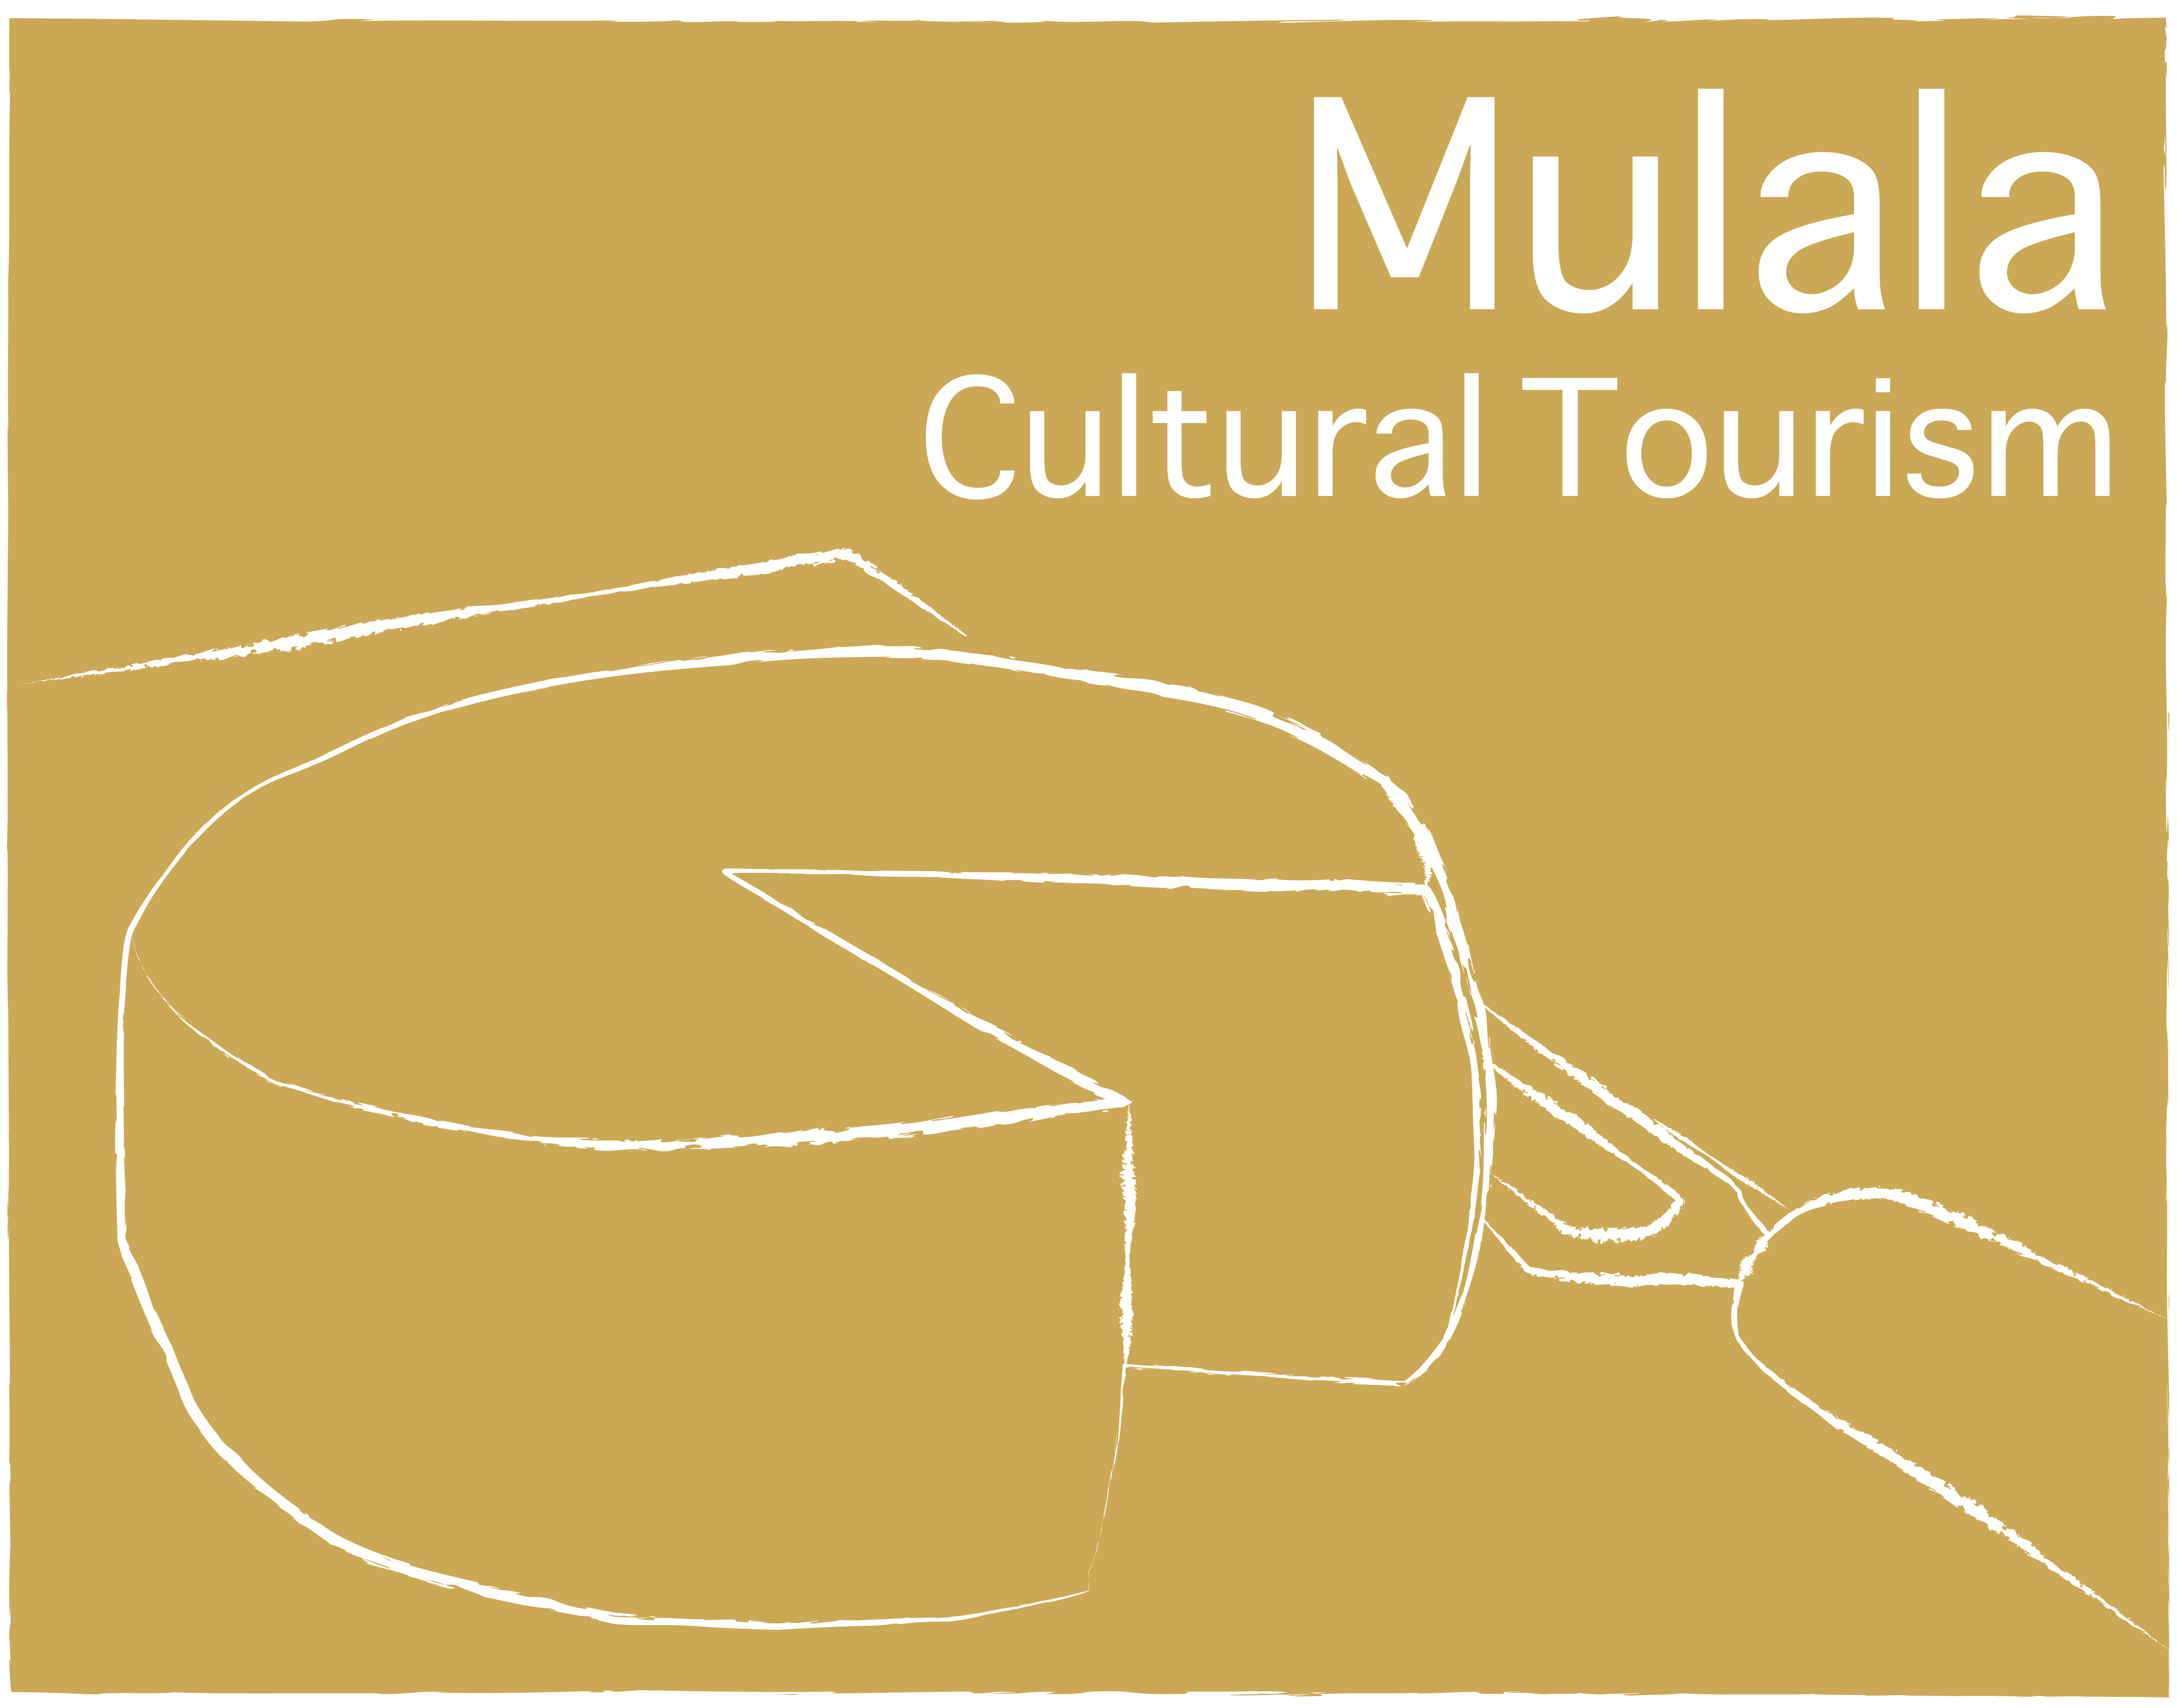 Mulala Cultural Tourism